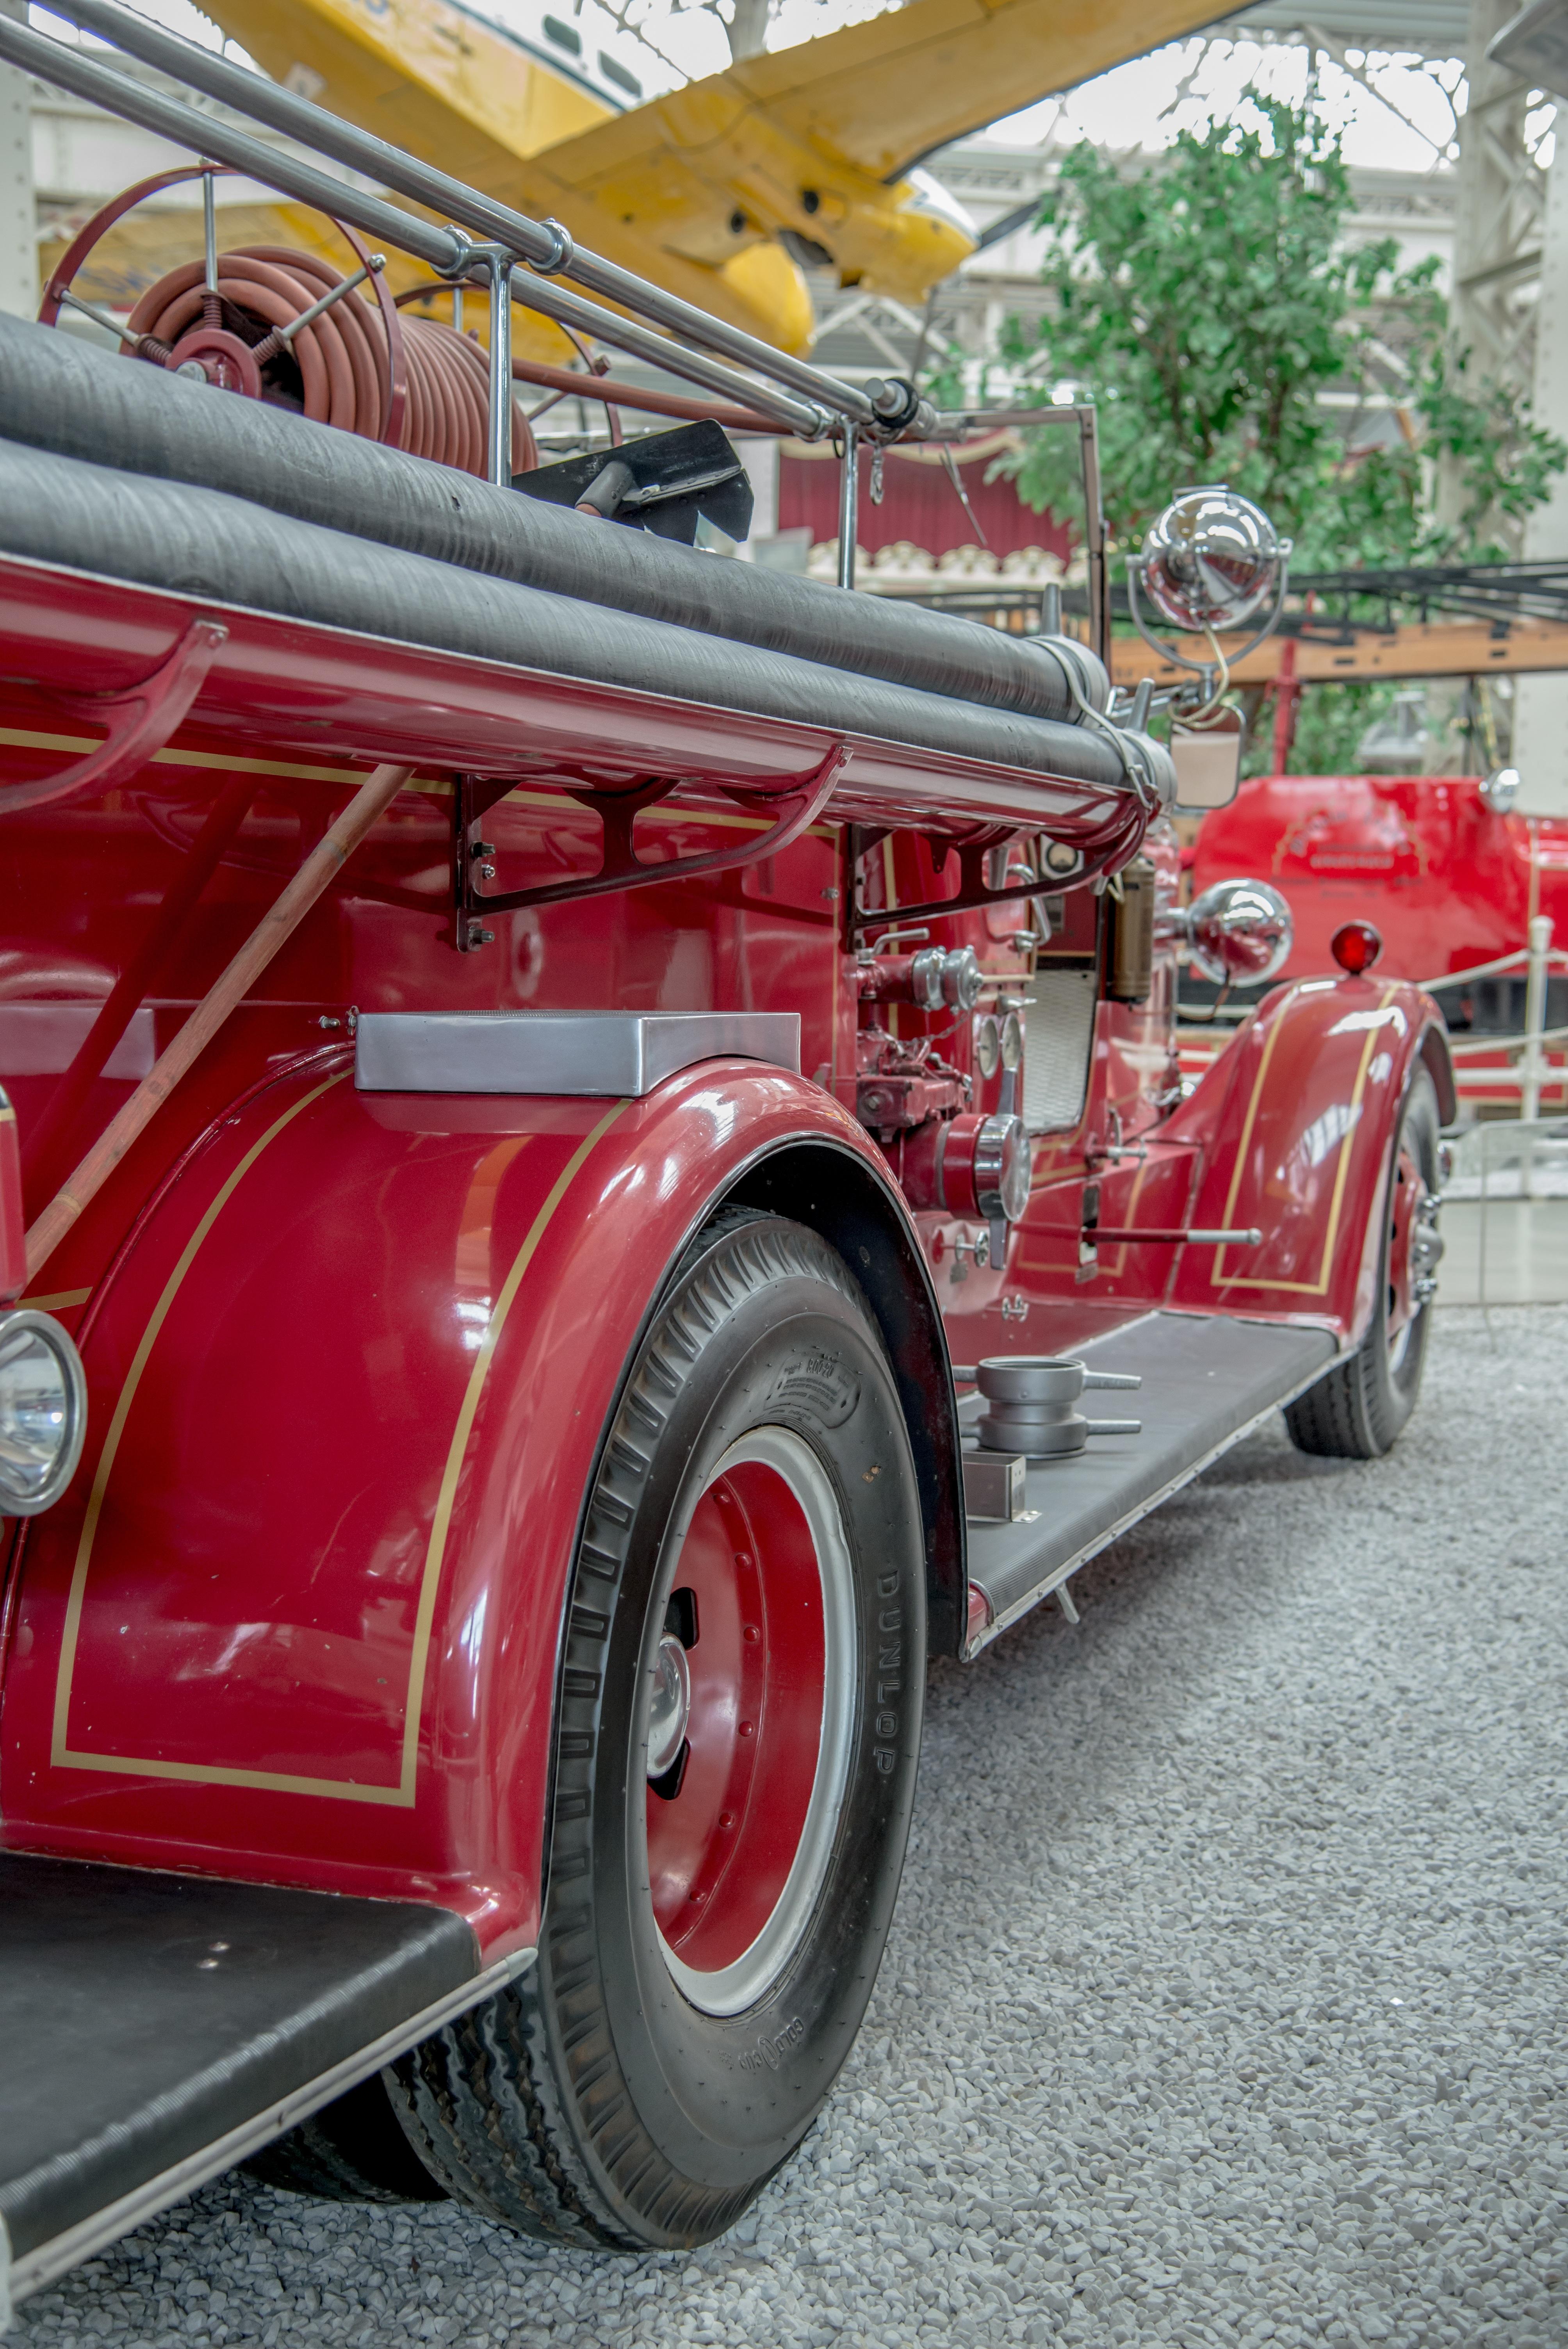 Free Images : wheel, retro, horn, red, equipment, auto, signal ...